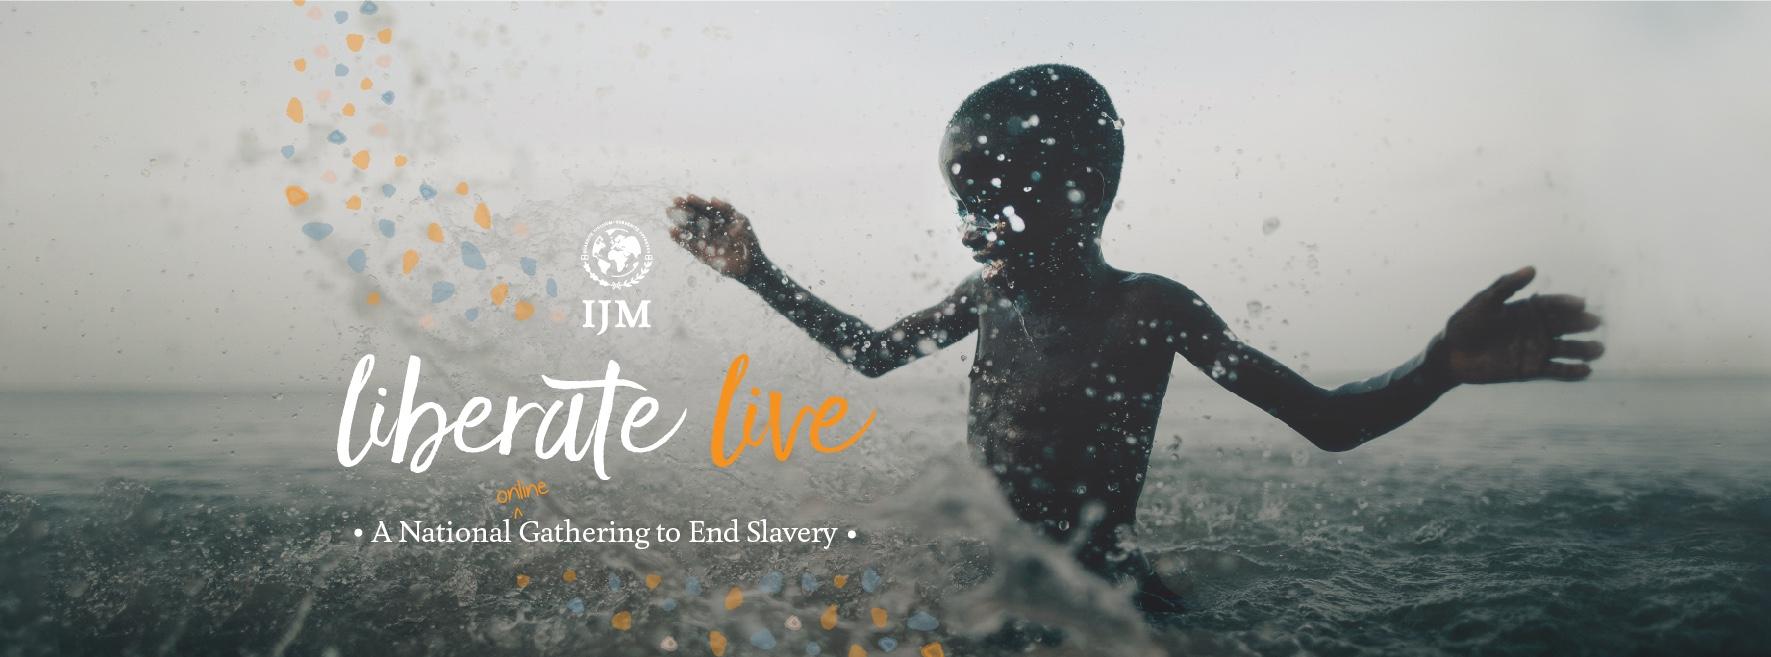 www.IJM.org.au/Liberate